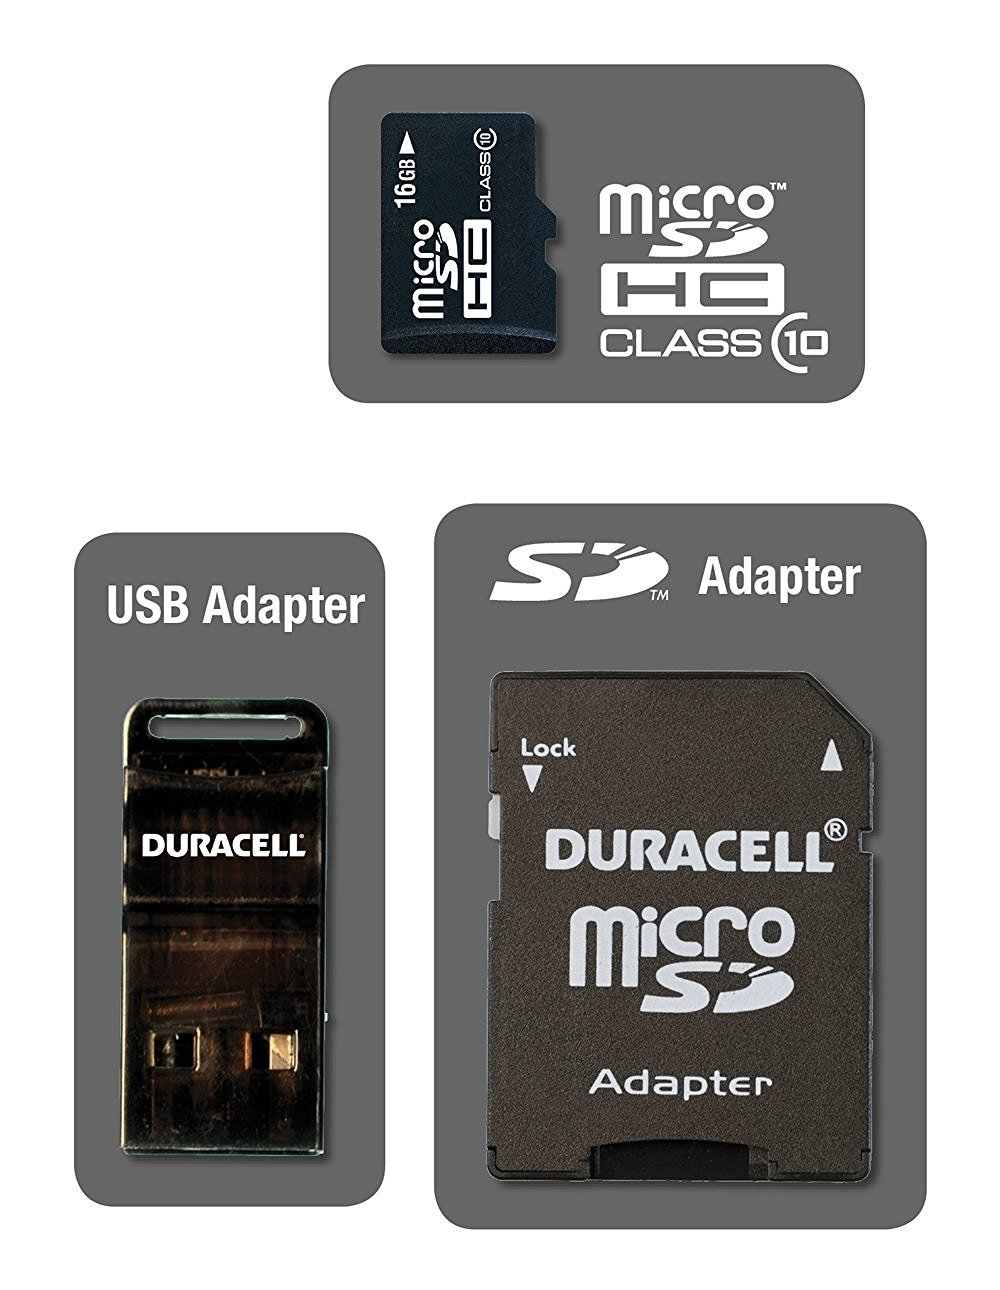 Duracell DU-3in1C10 16GB Class 10 microSDHC..